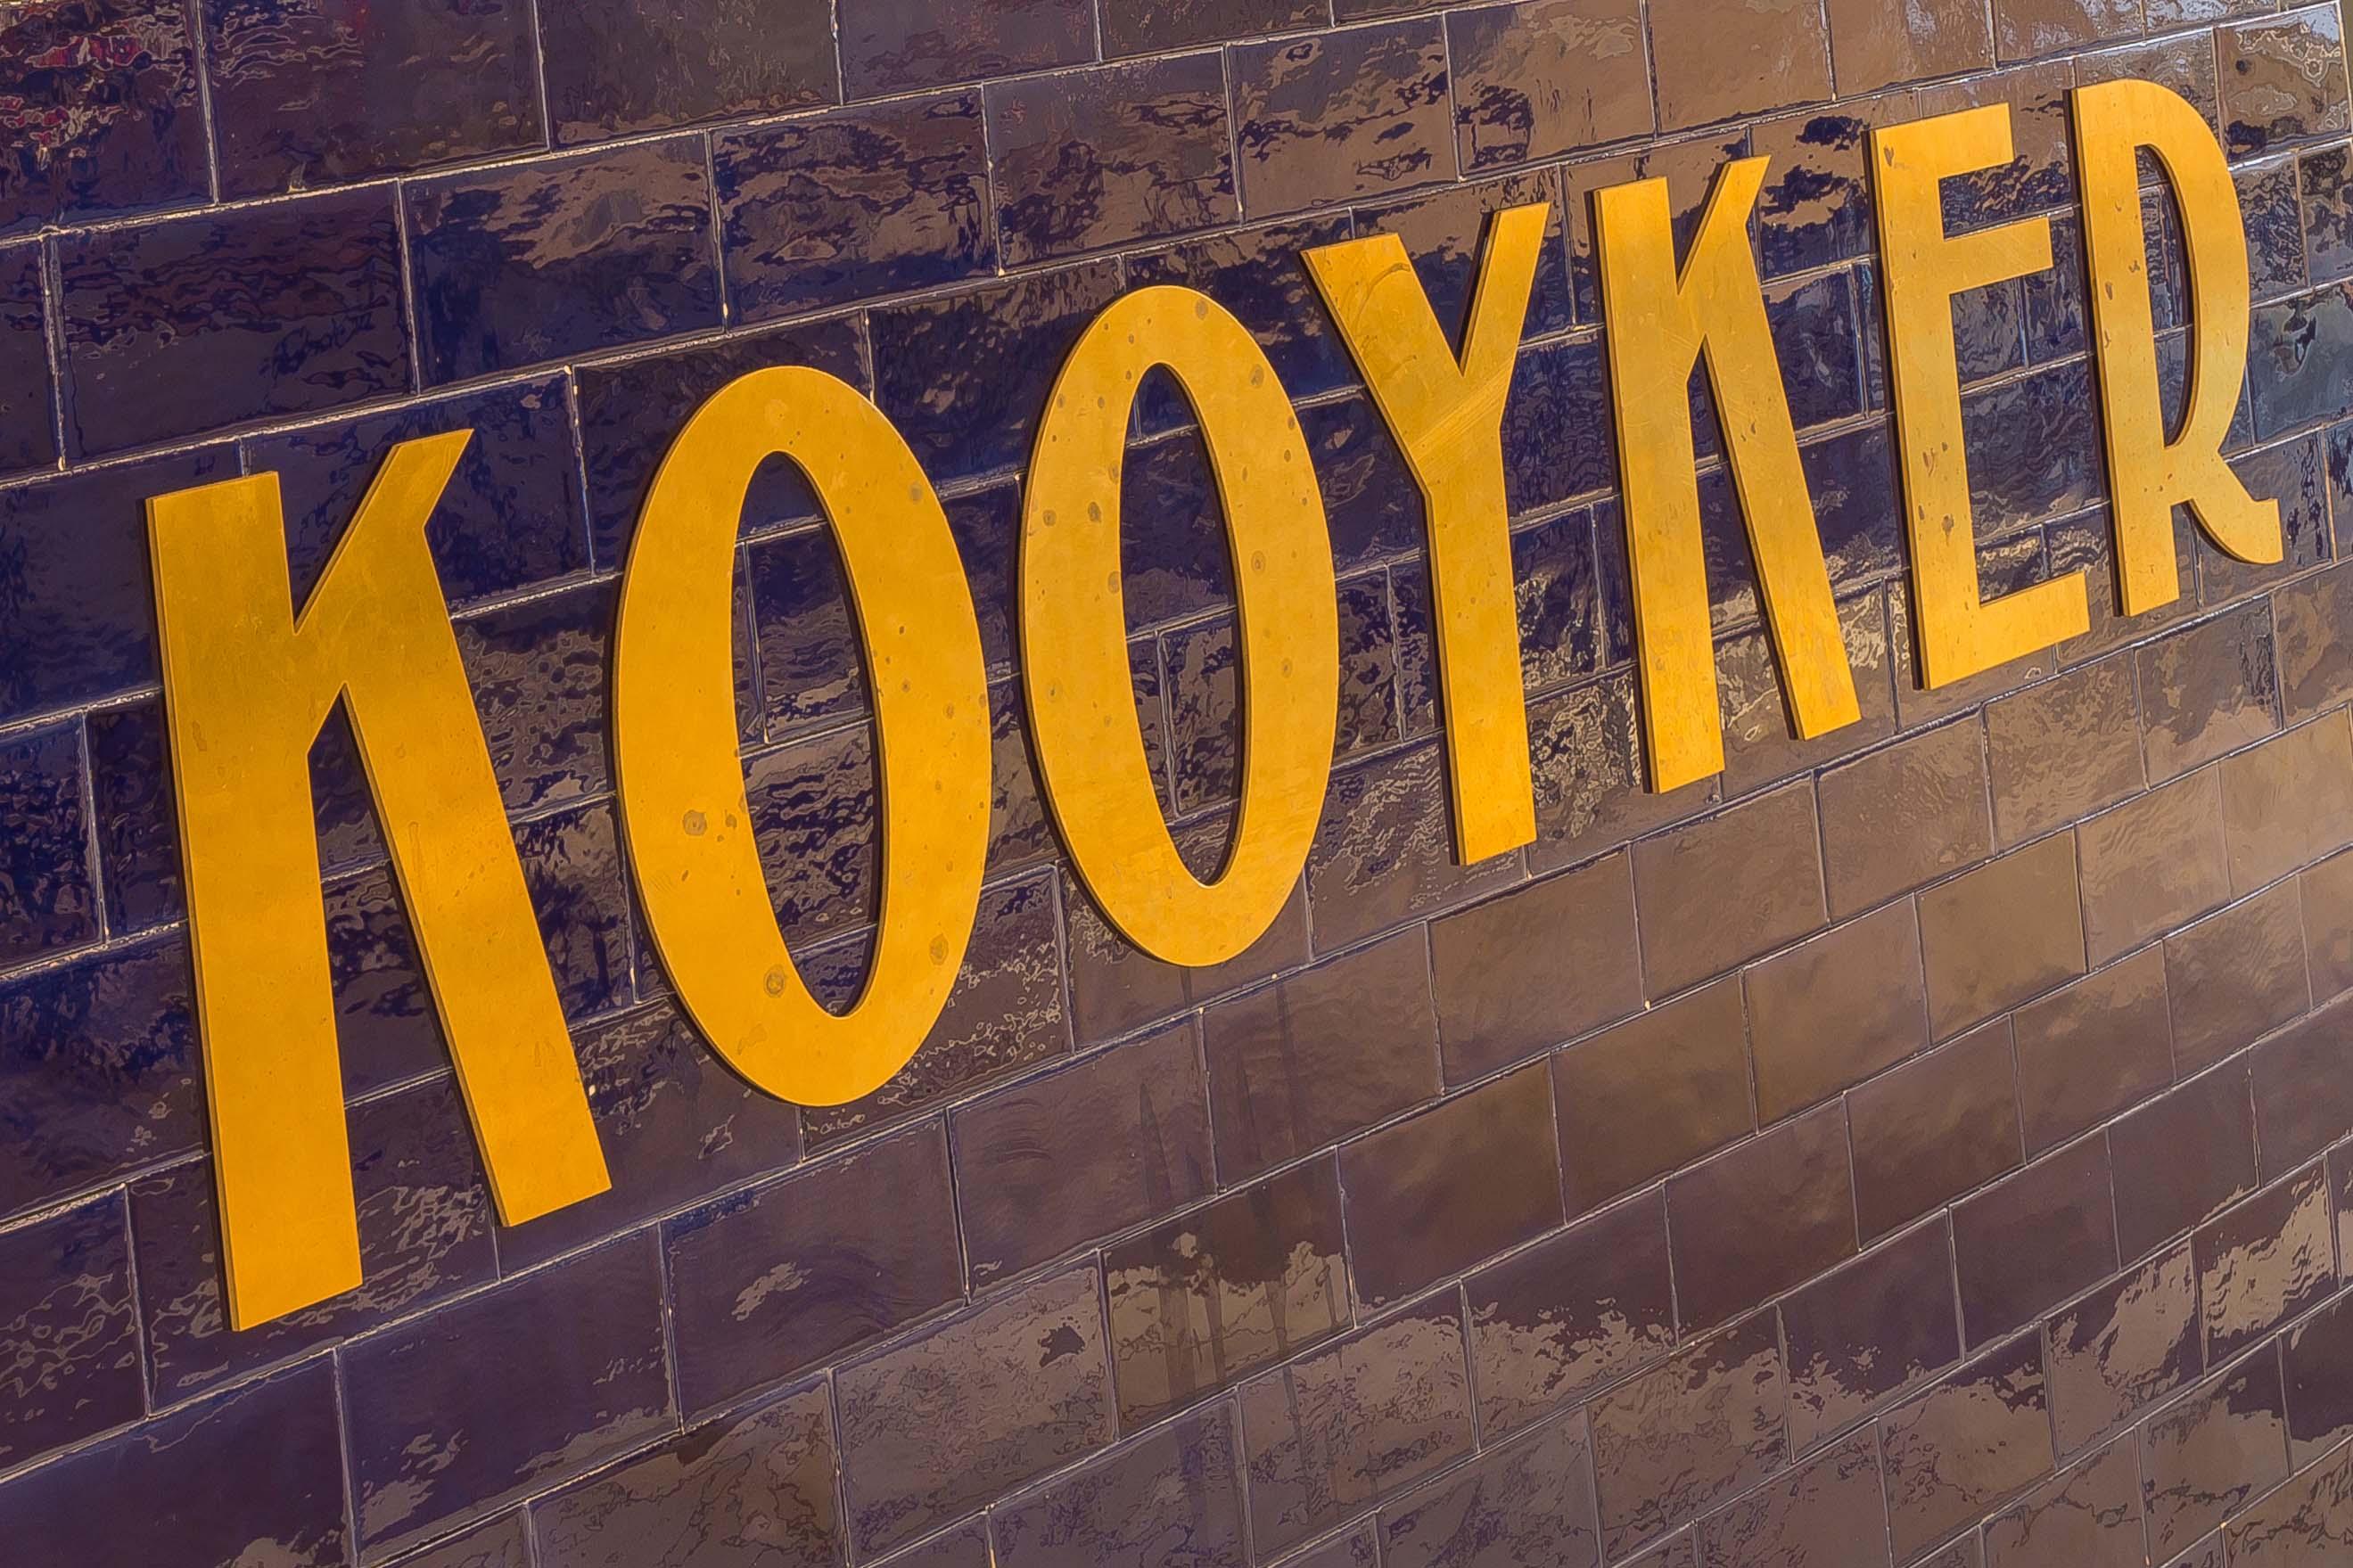 Hiddemafotografie-boekhandel kooyker (10)